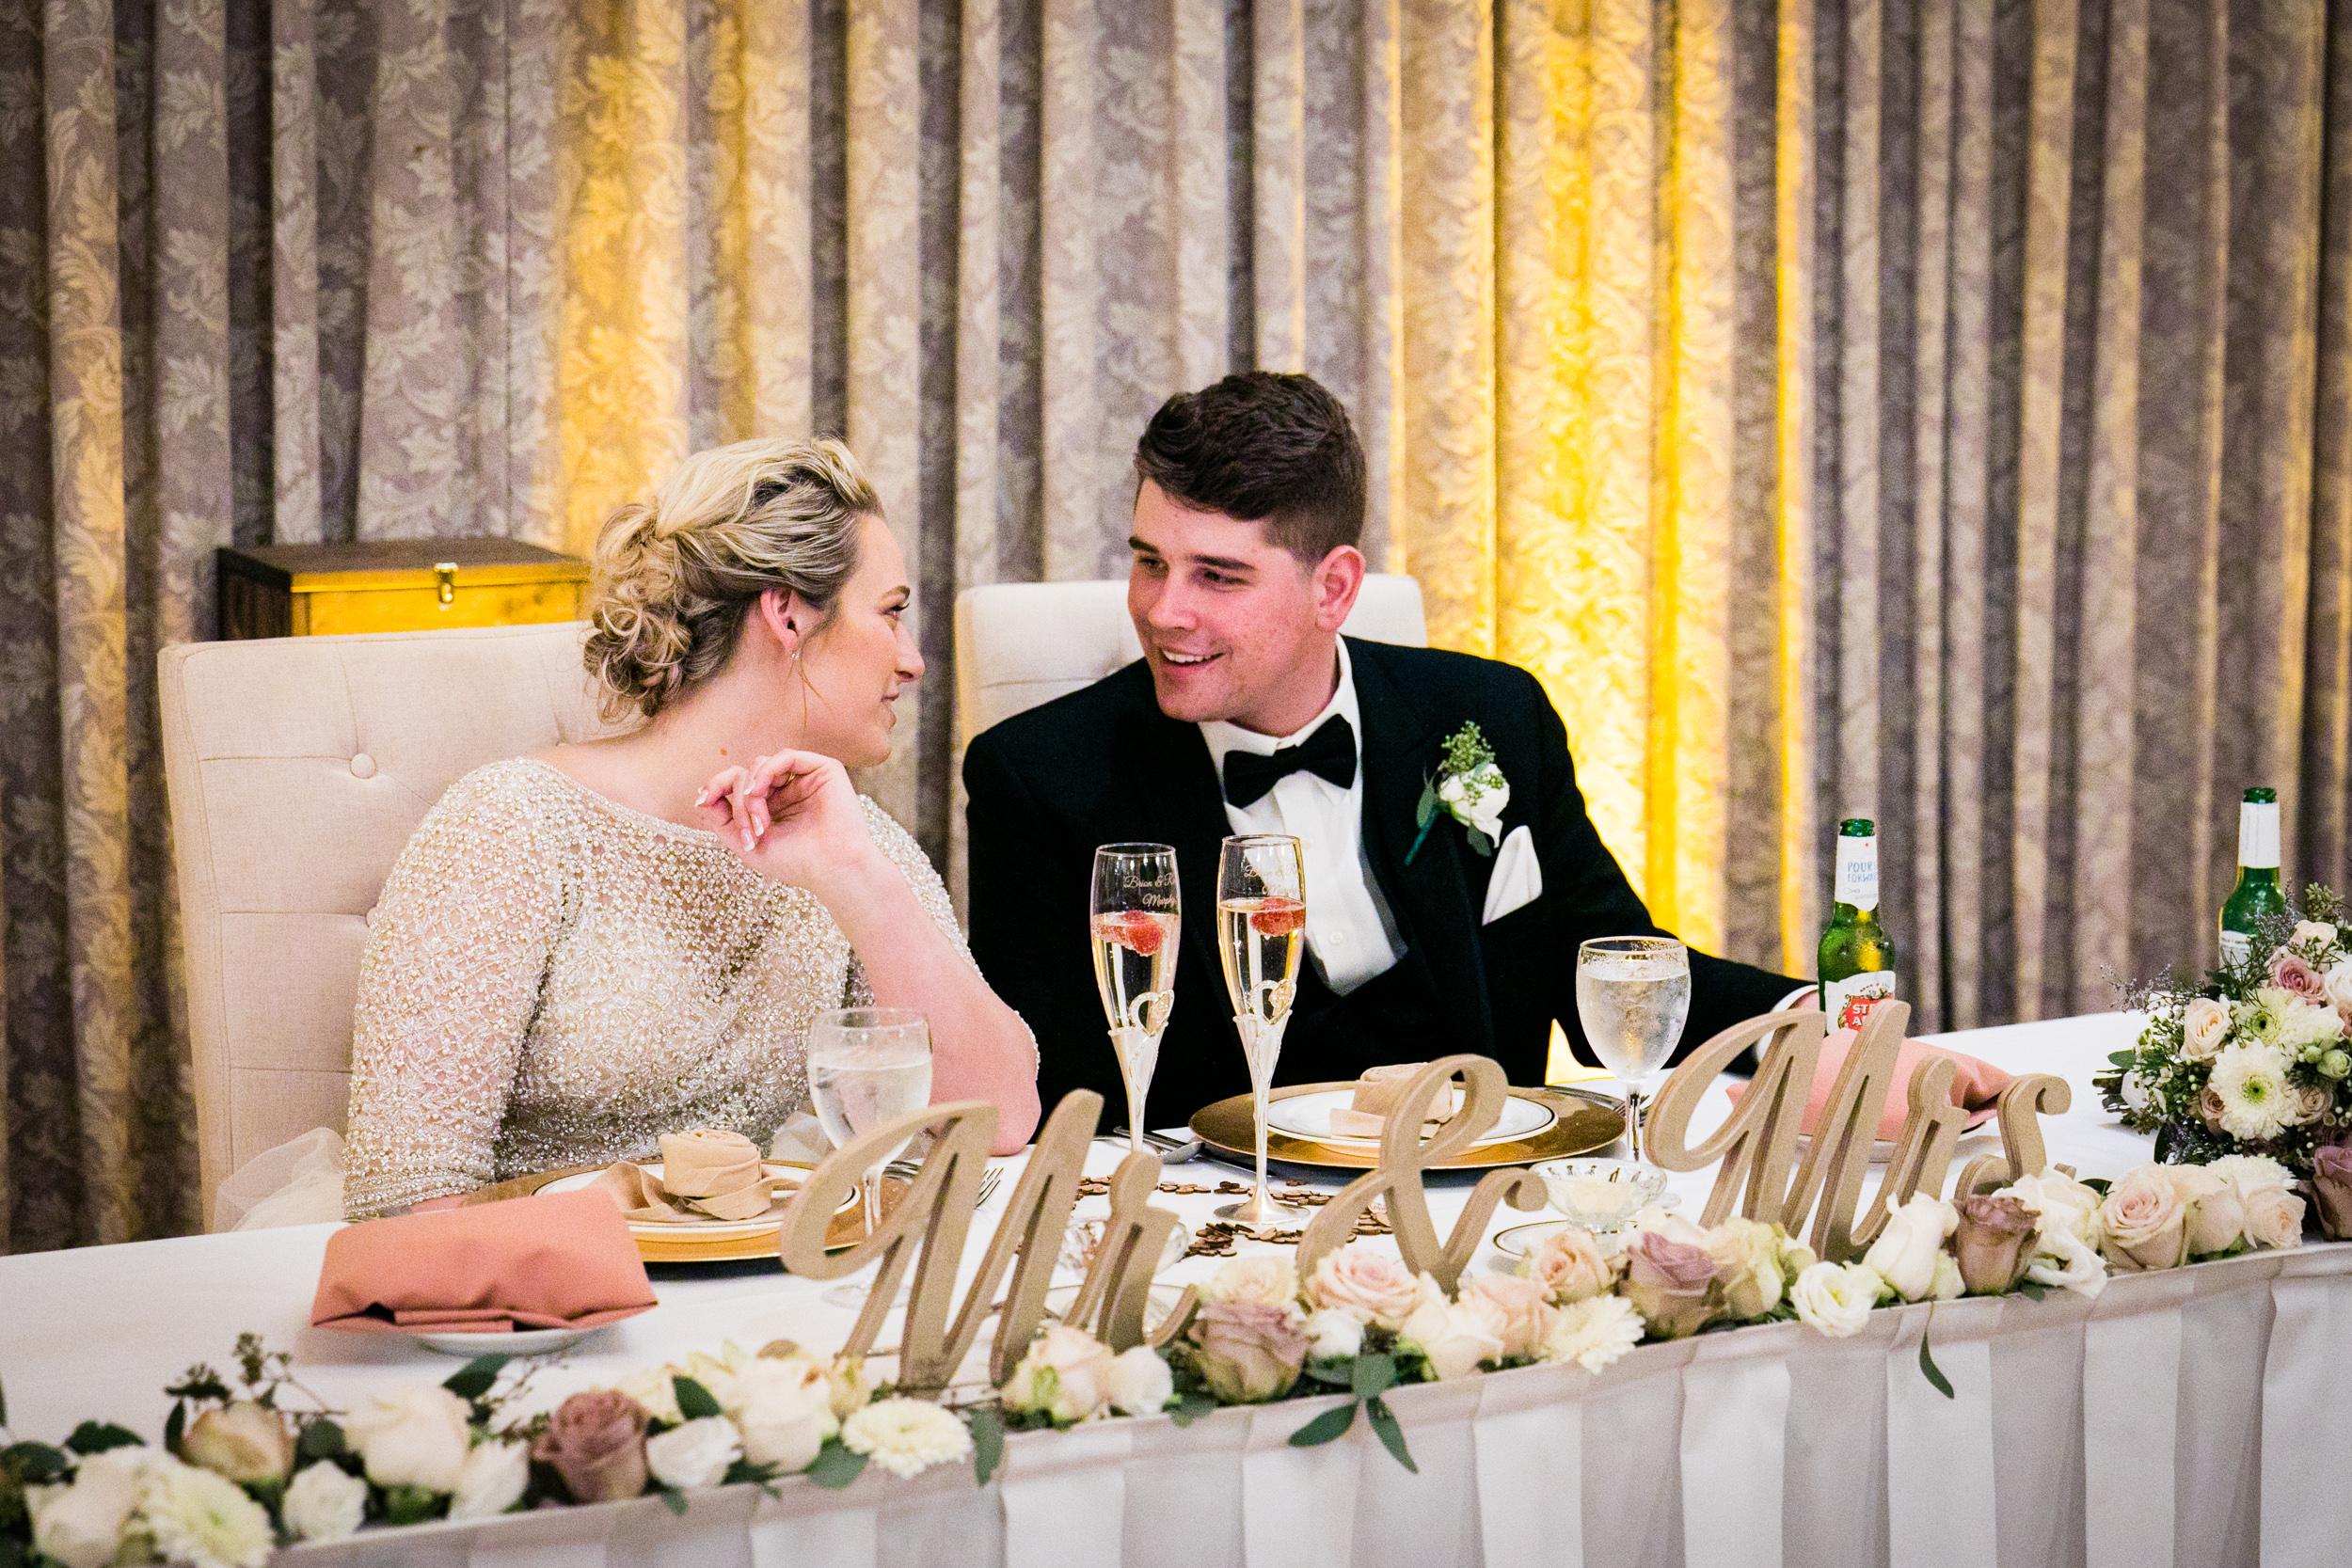 CELEBRATIONS BENSALEM WEDDING PHOTOGRAPHY-82.jpg